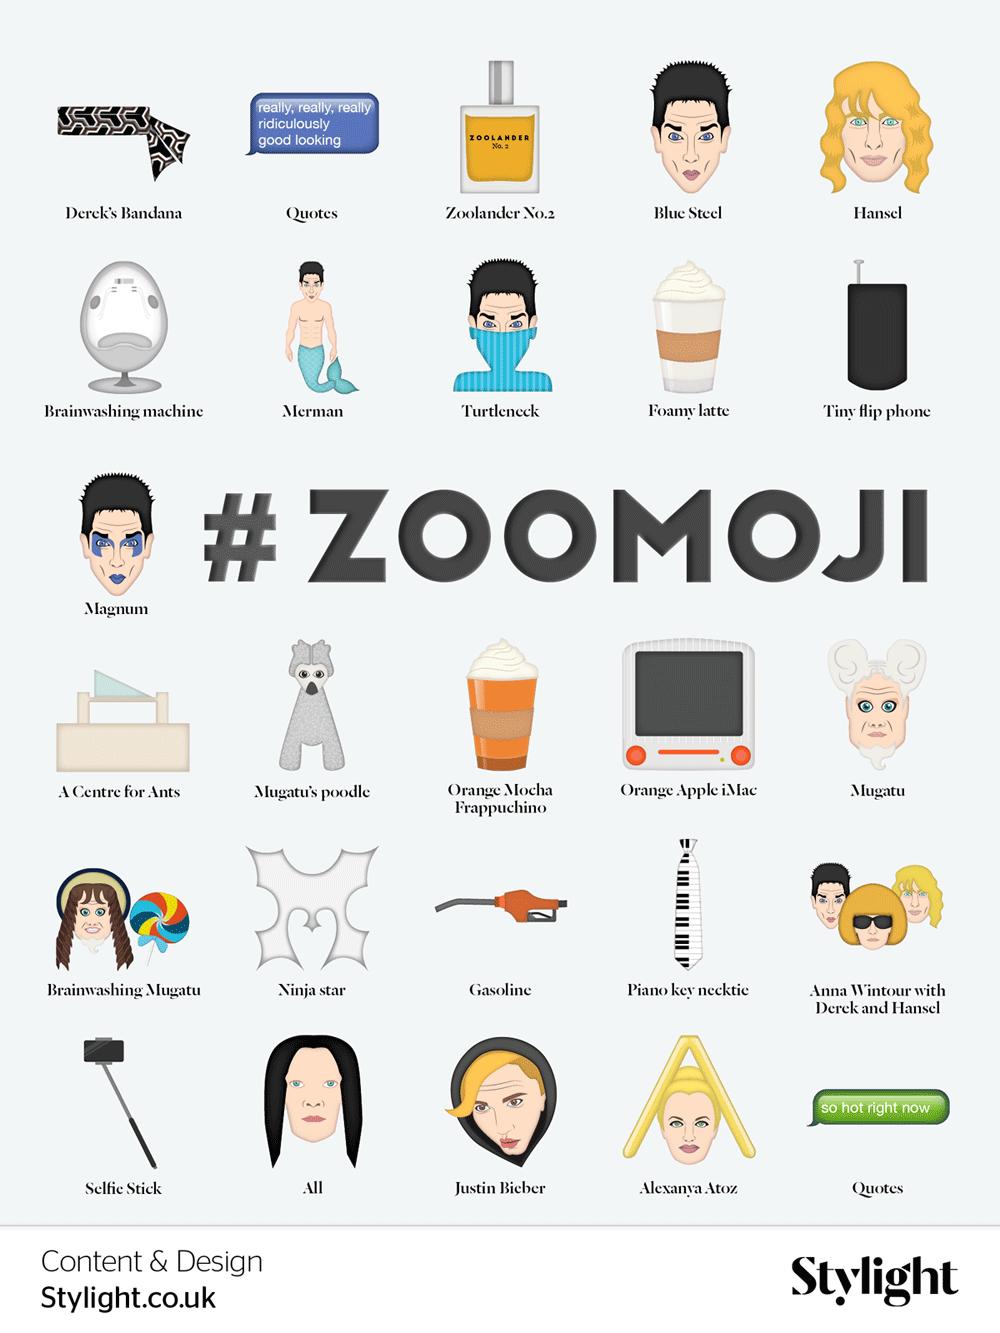 Stylight Zoomojis